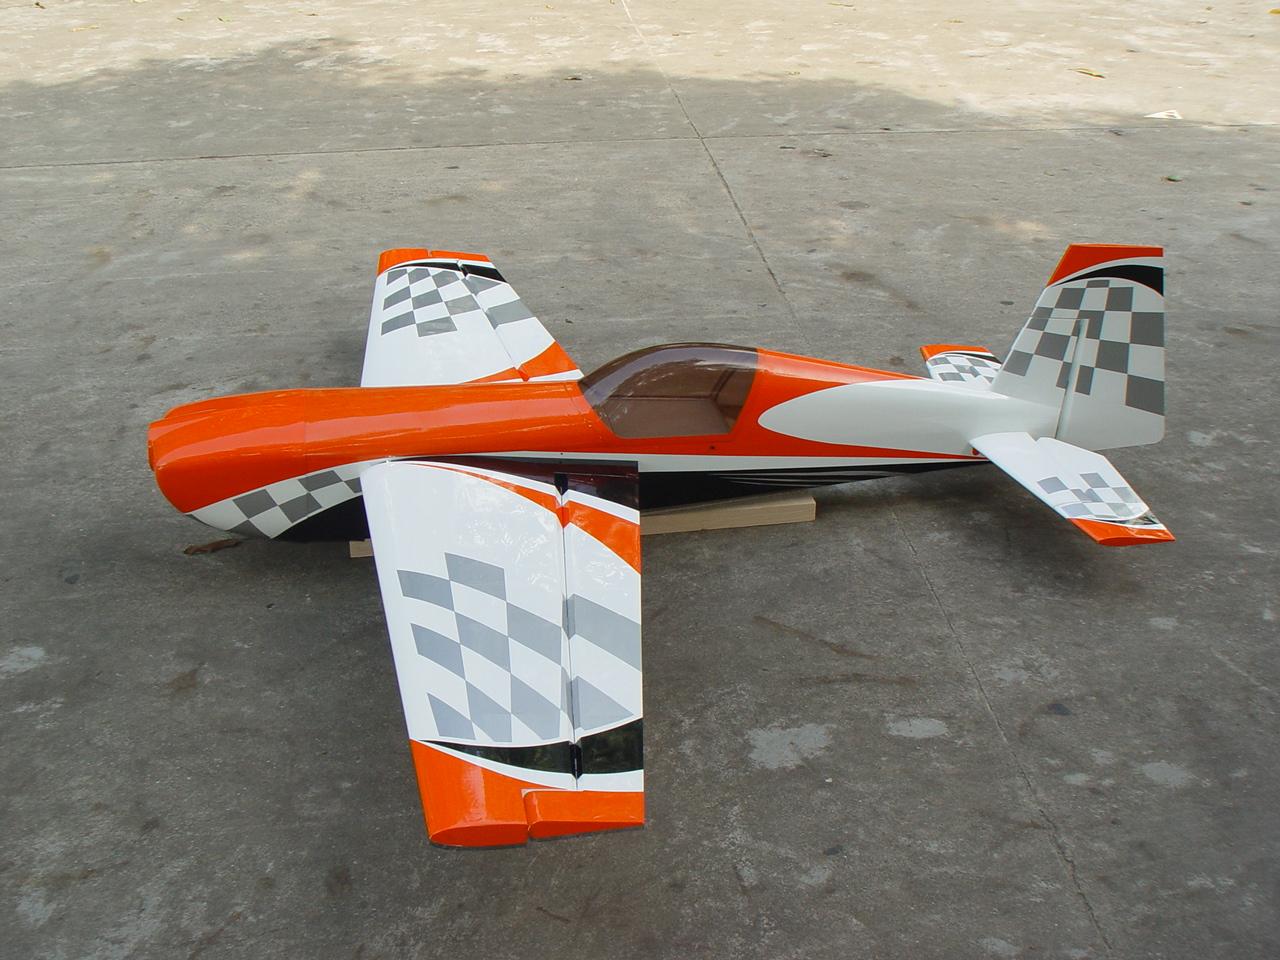 extra 330sc pilot rc orange silver checker. Black Bedroom Furniture Sets. Home Design Ideas